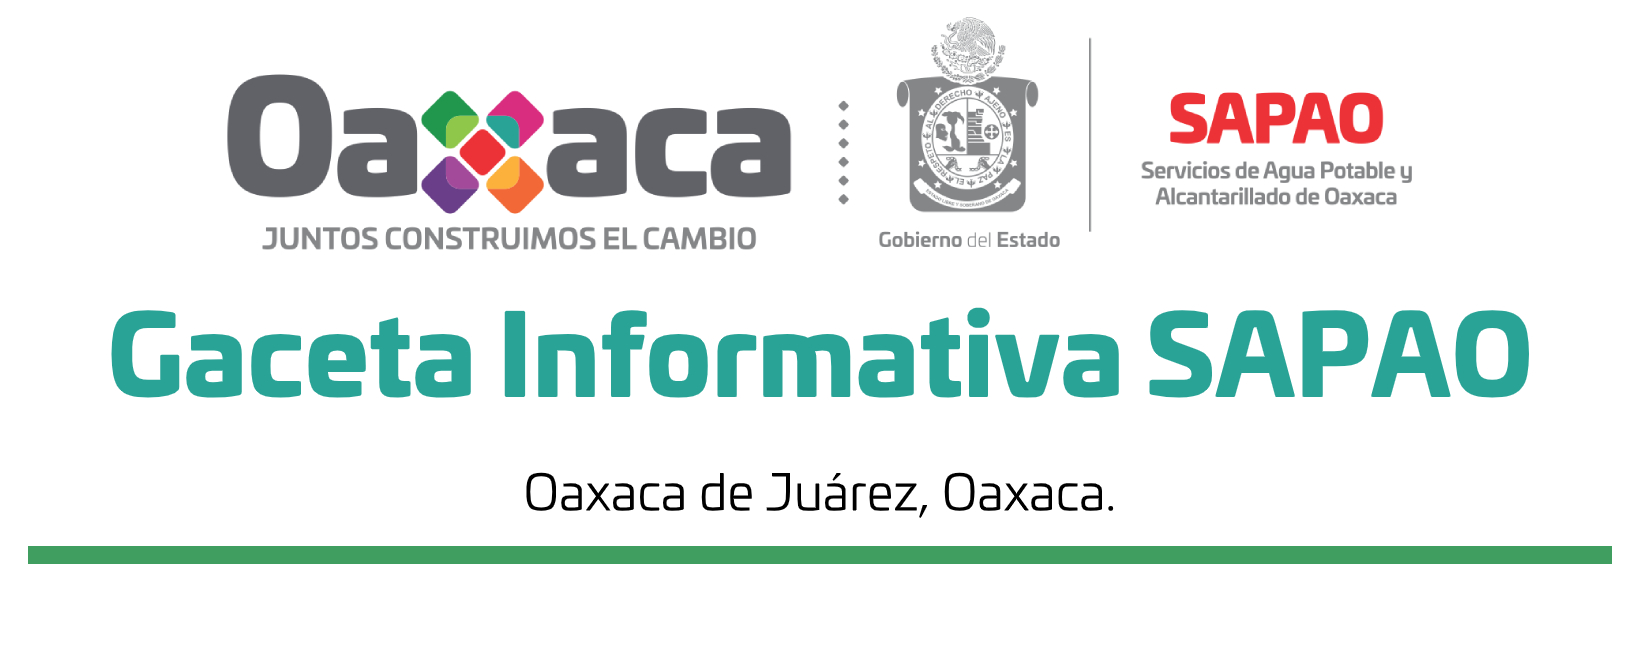 Gaceta informativa SAPAO Marzo 2020